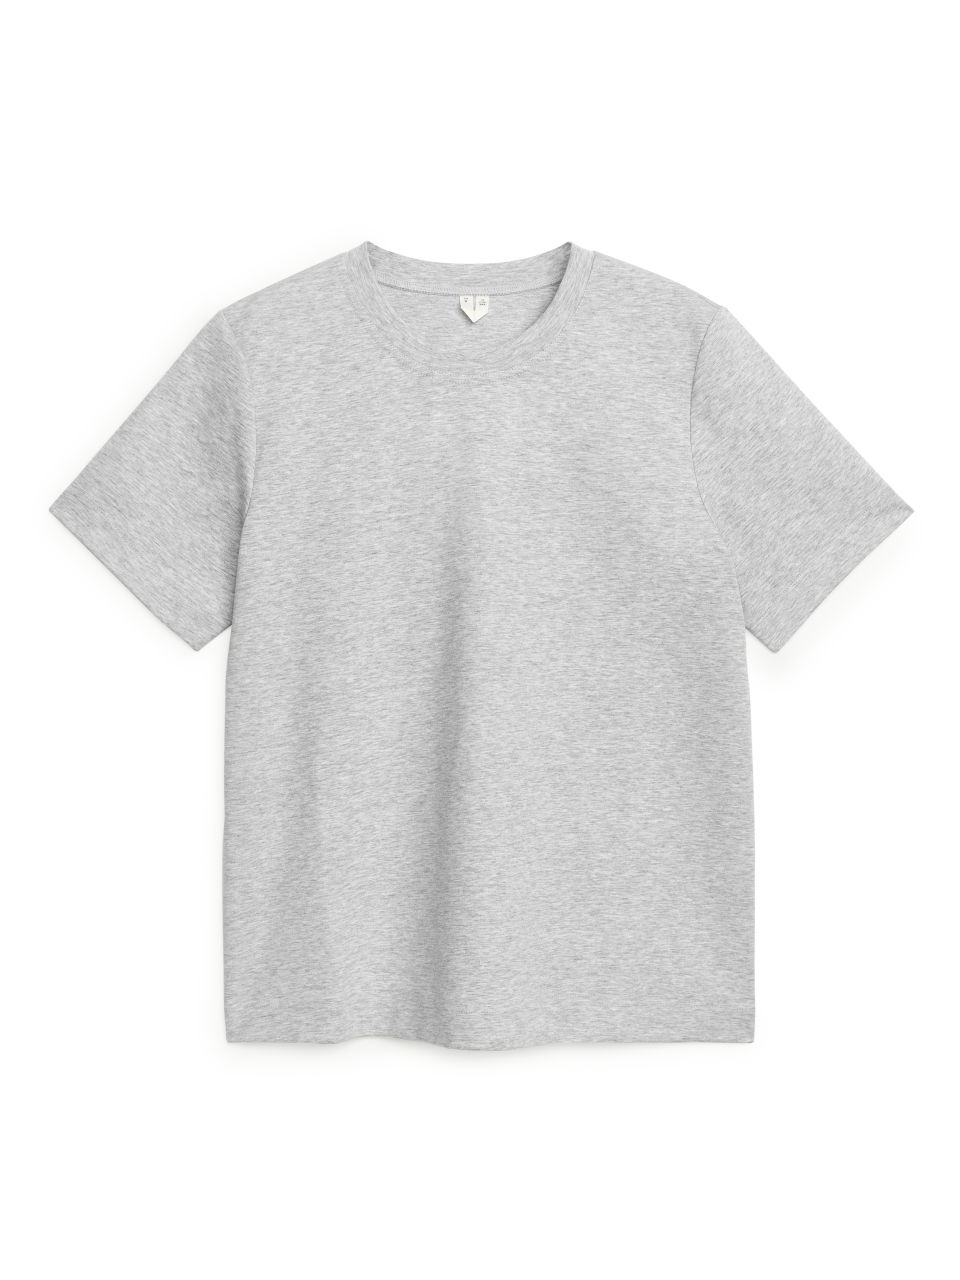 Heavy-Weight T-Shirt - Grey